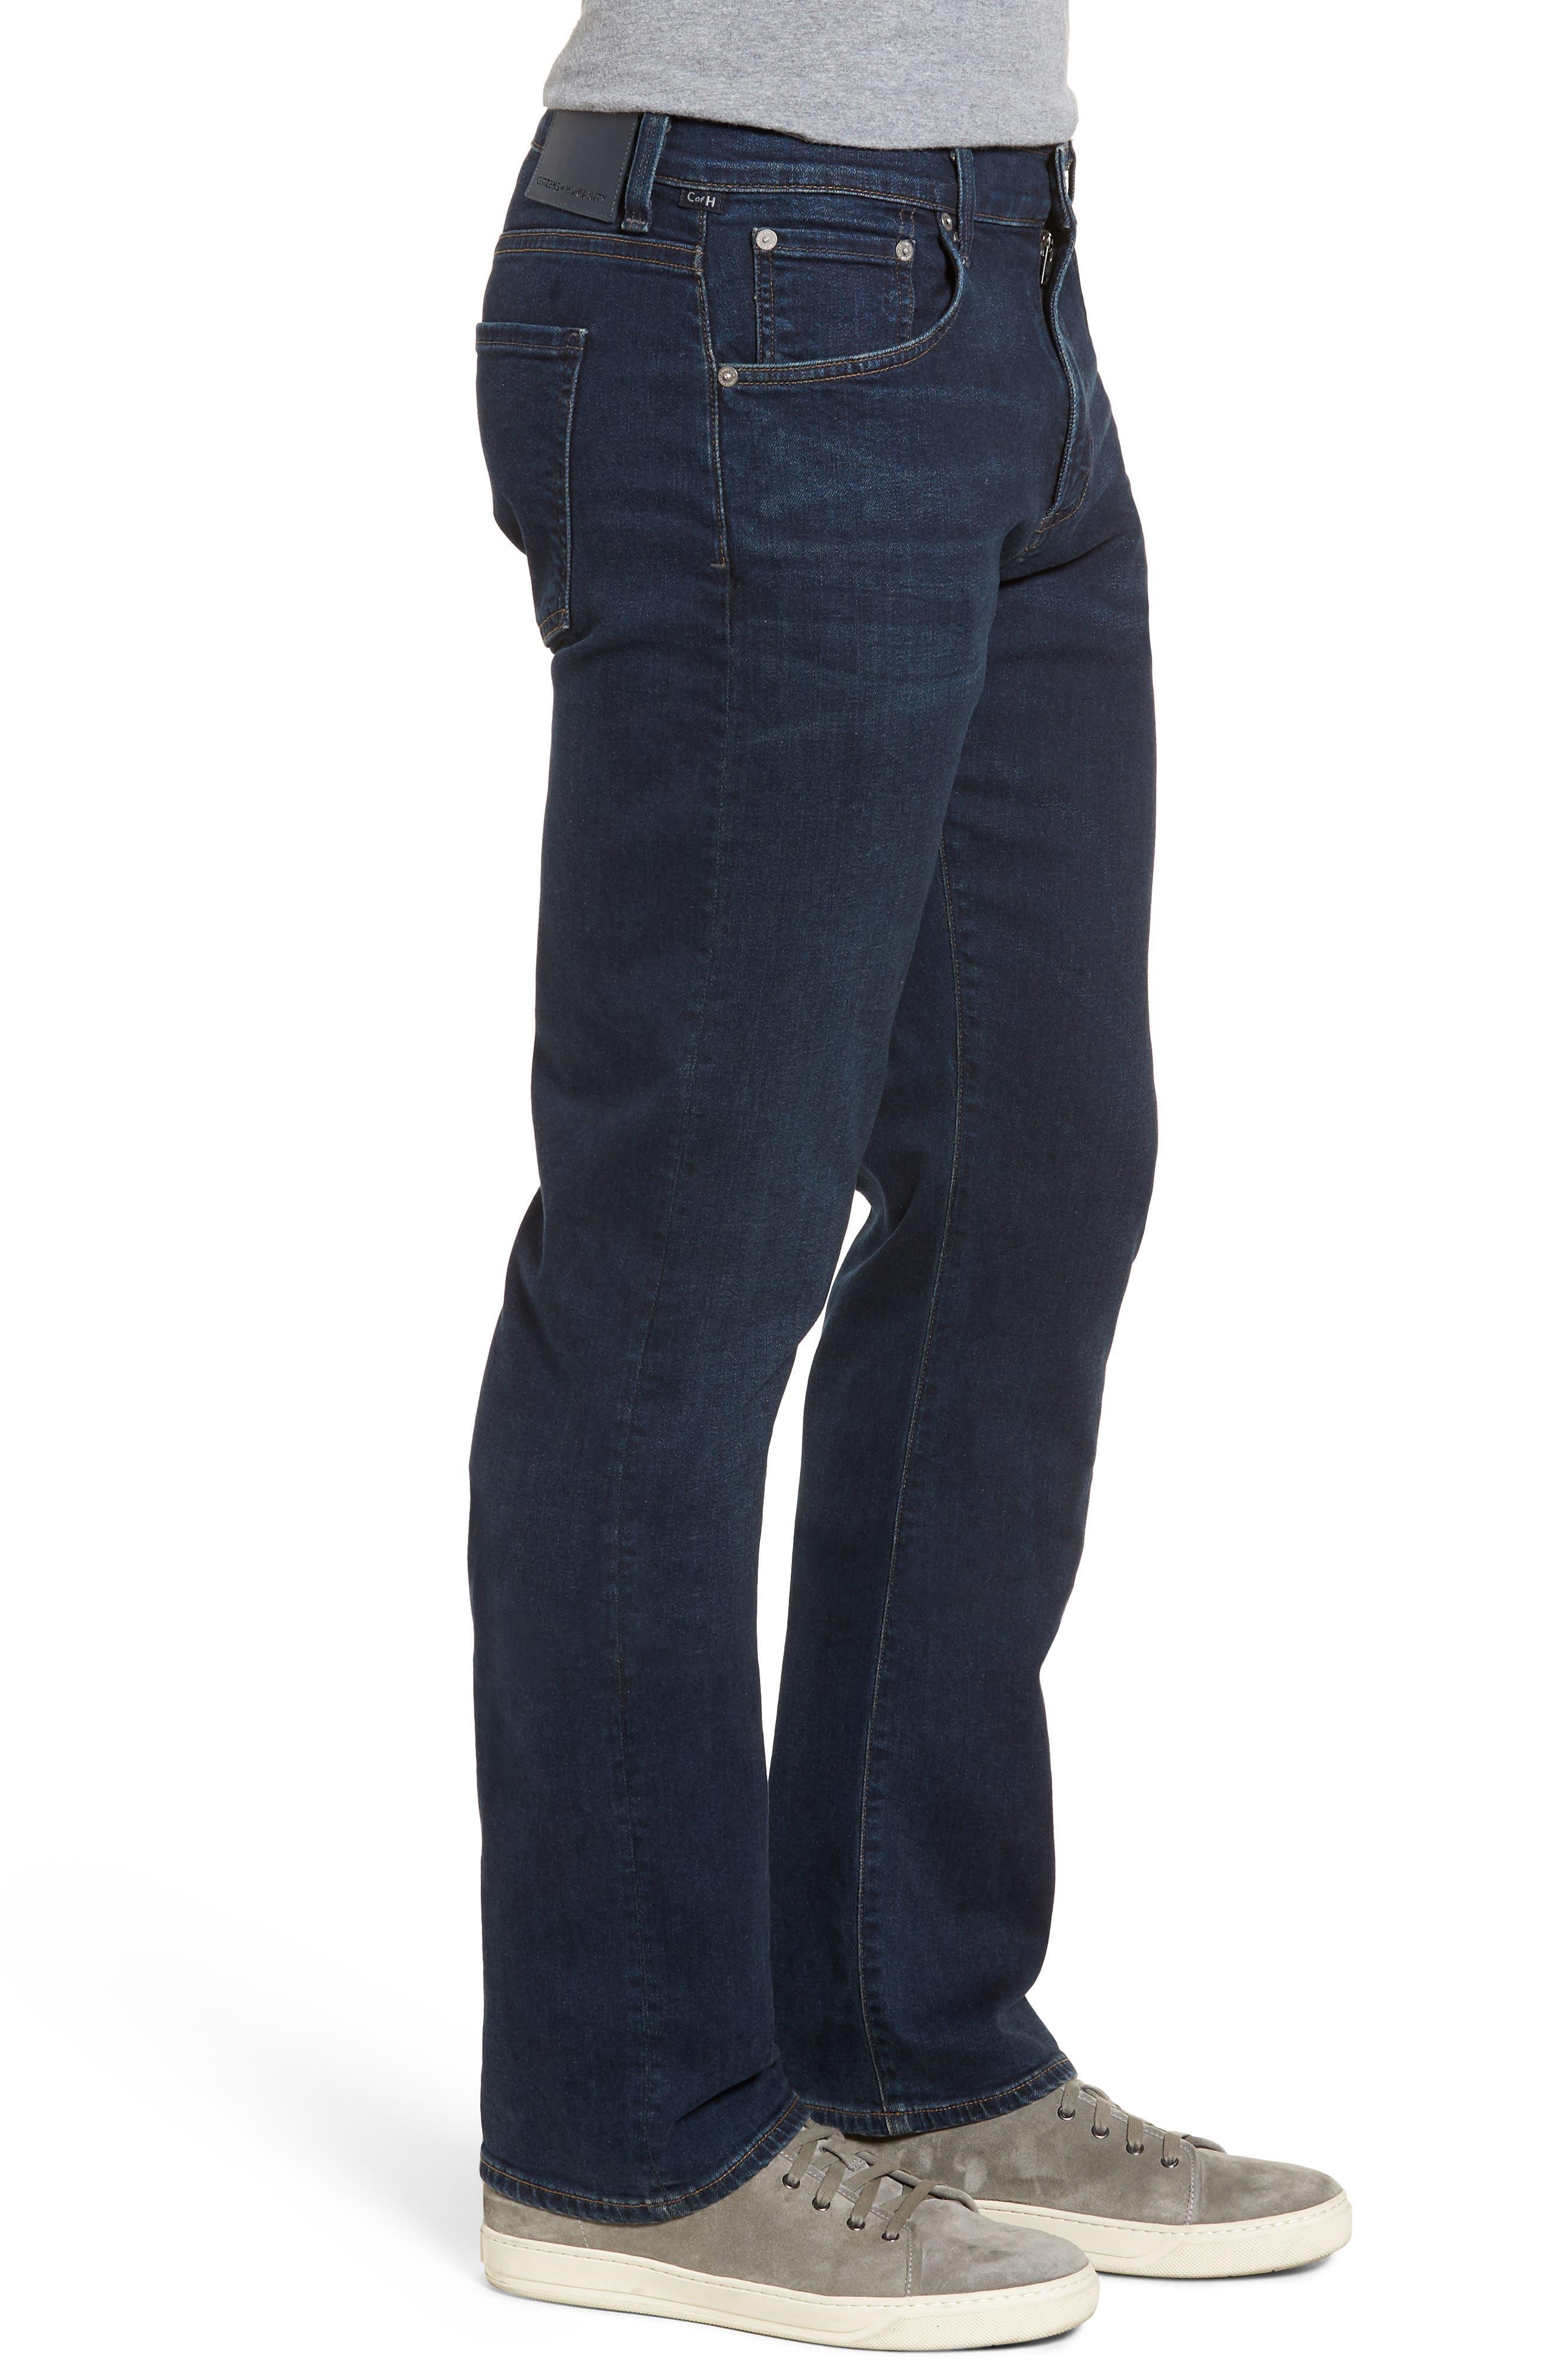 Perform - Sid Straight Leg Jeans,                             Alternate thumbnail 3, color,                             EVERSON